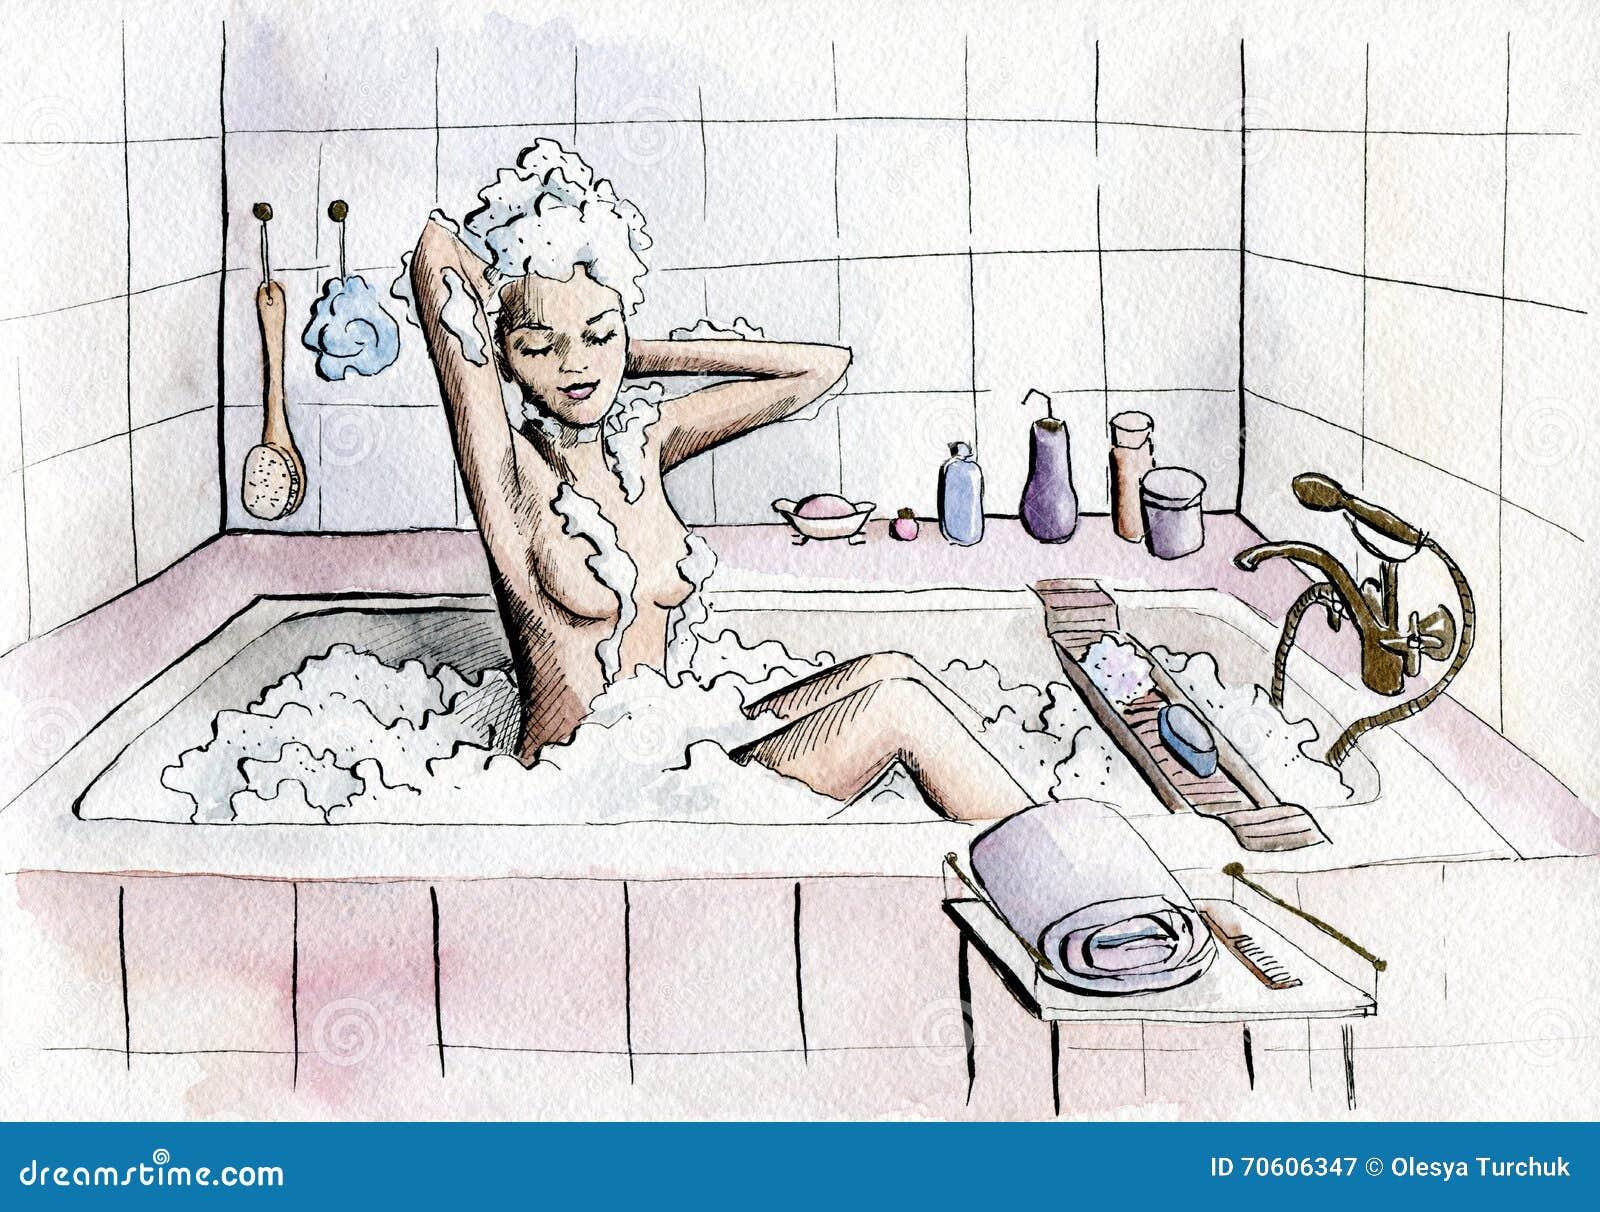 Similar Beautiful and naked sexy bath girls interesting